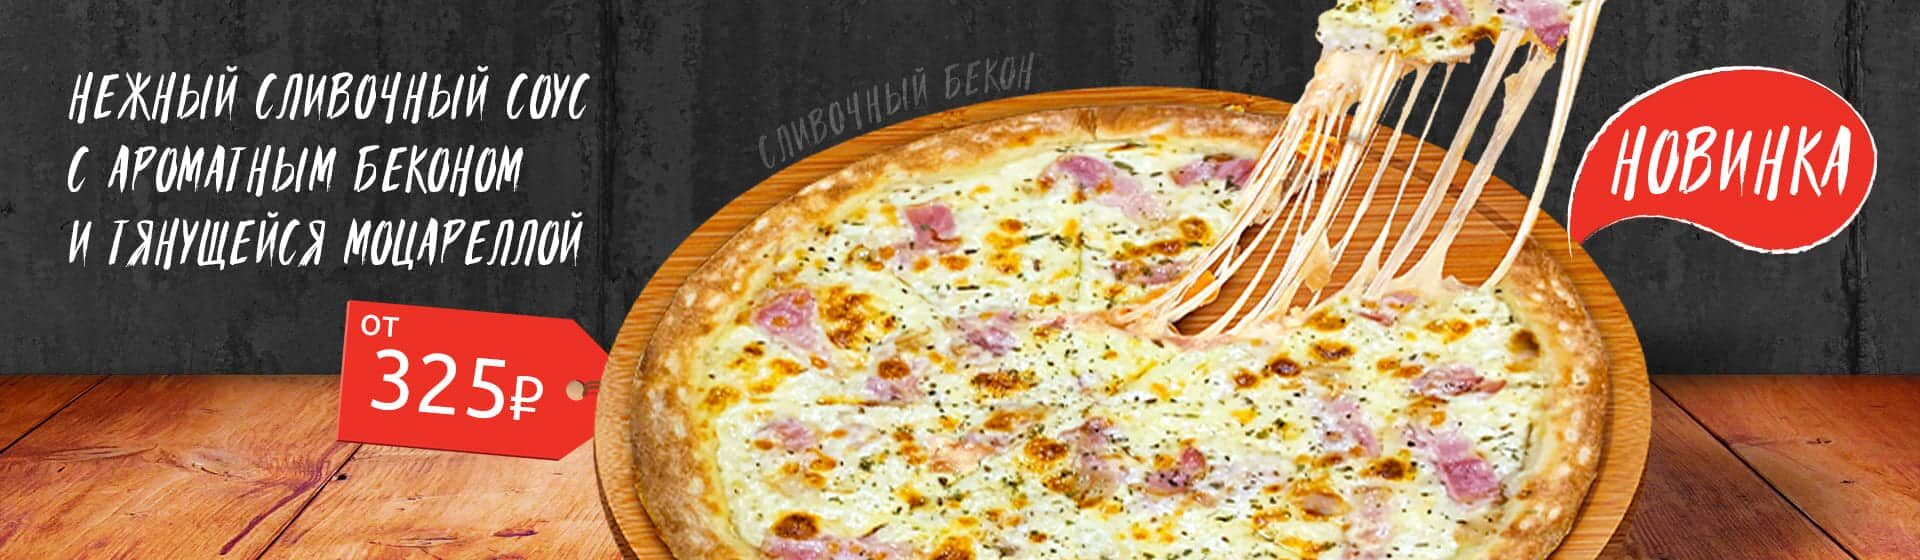 новинка Пицца Сливочный бекон